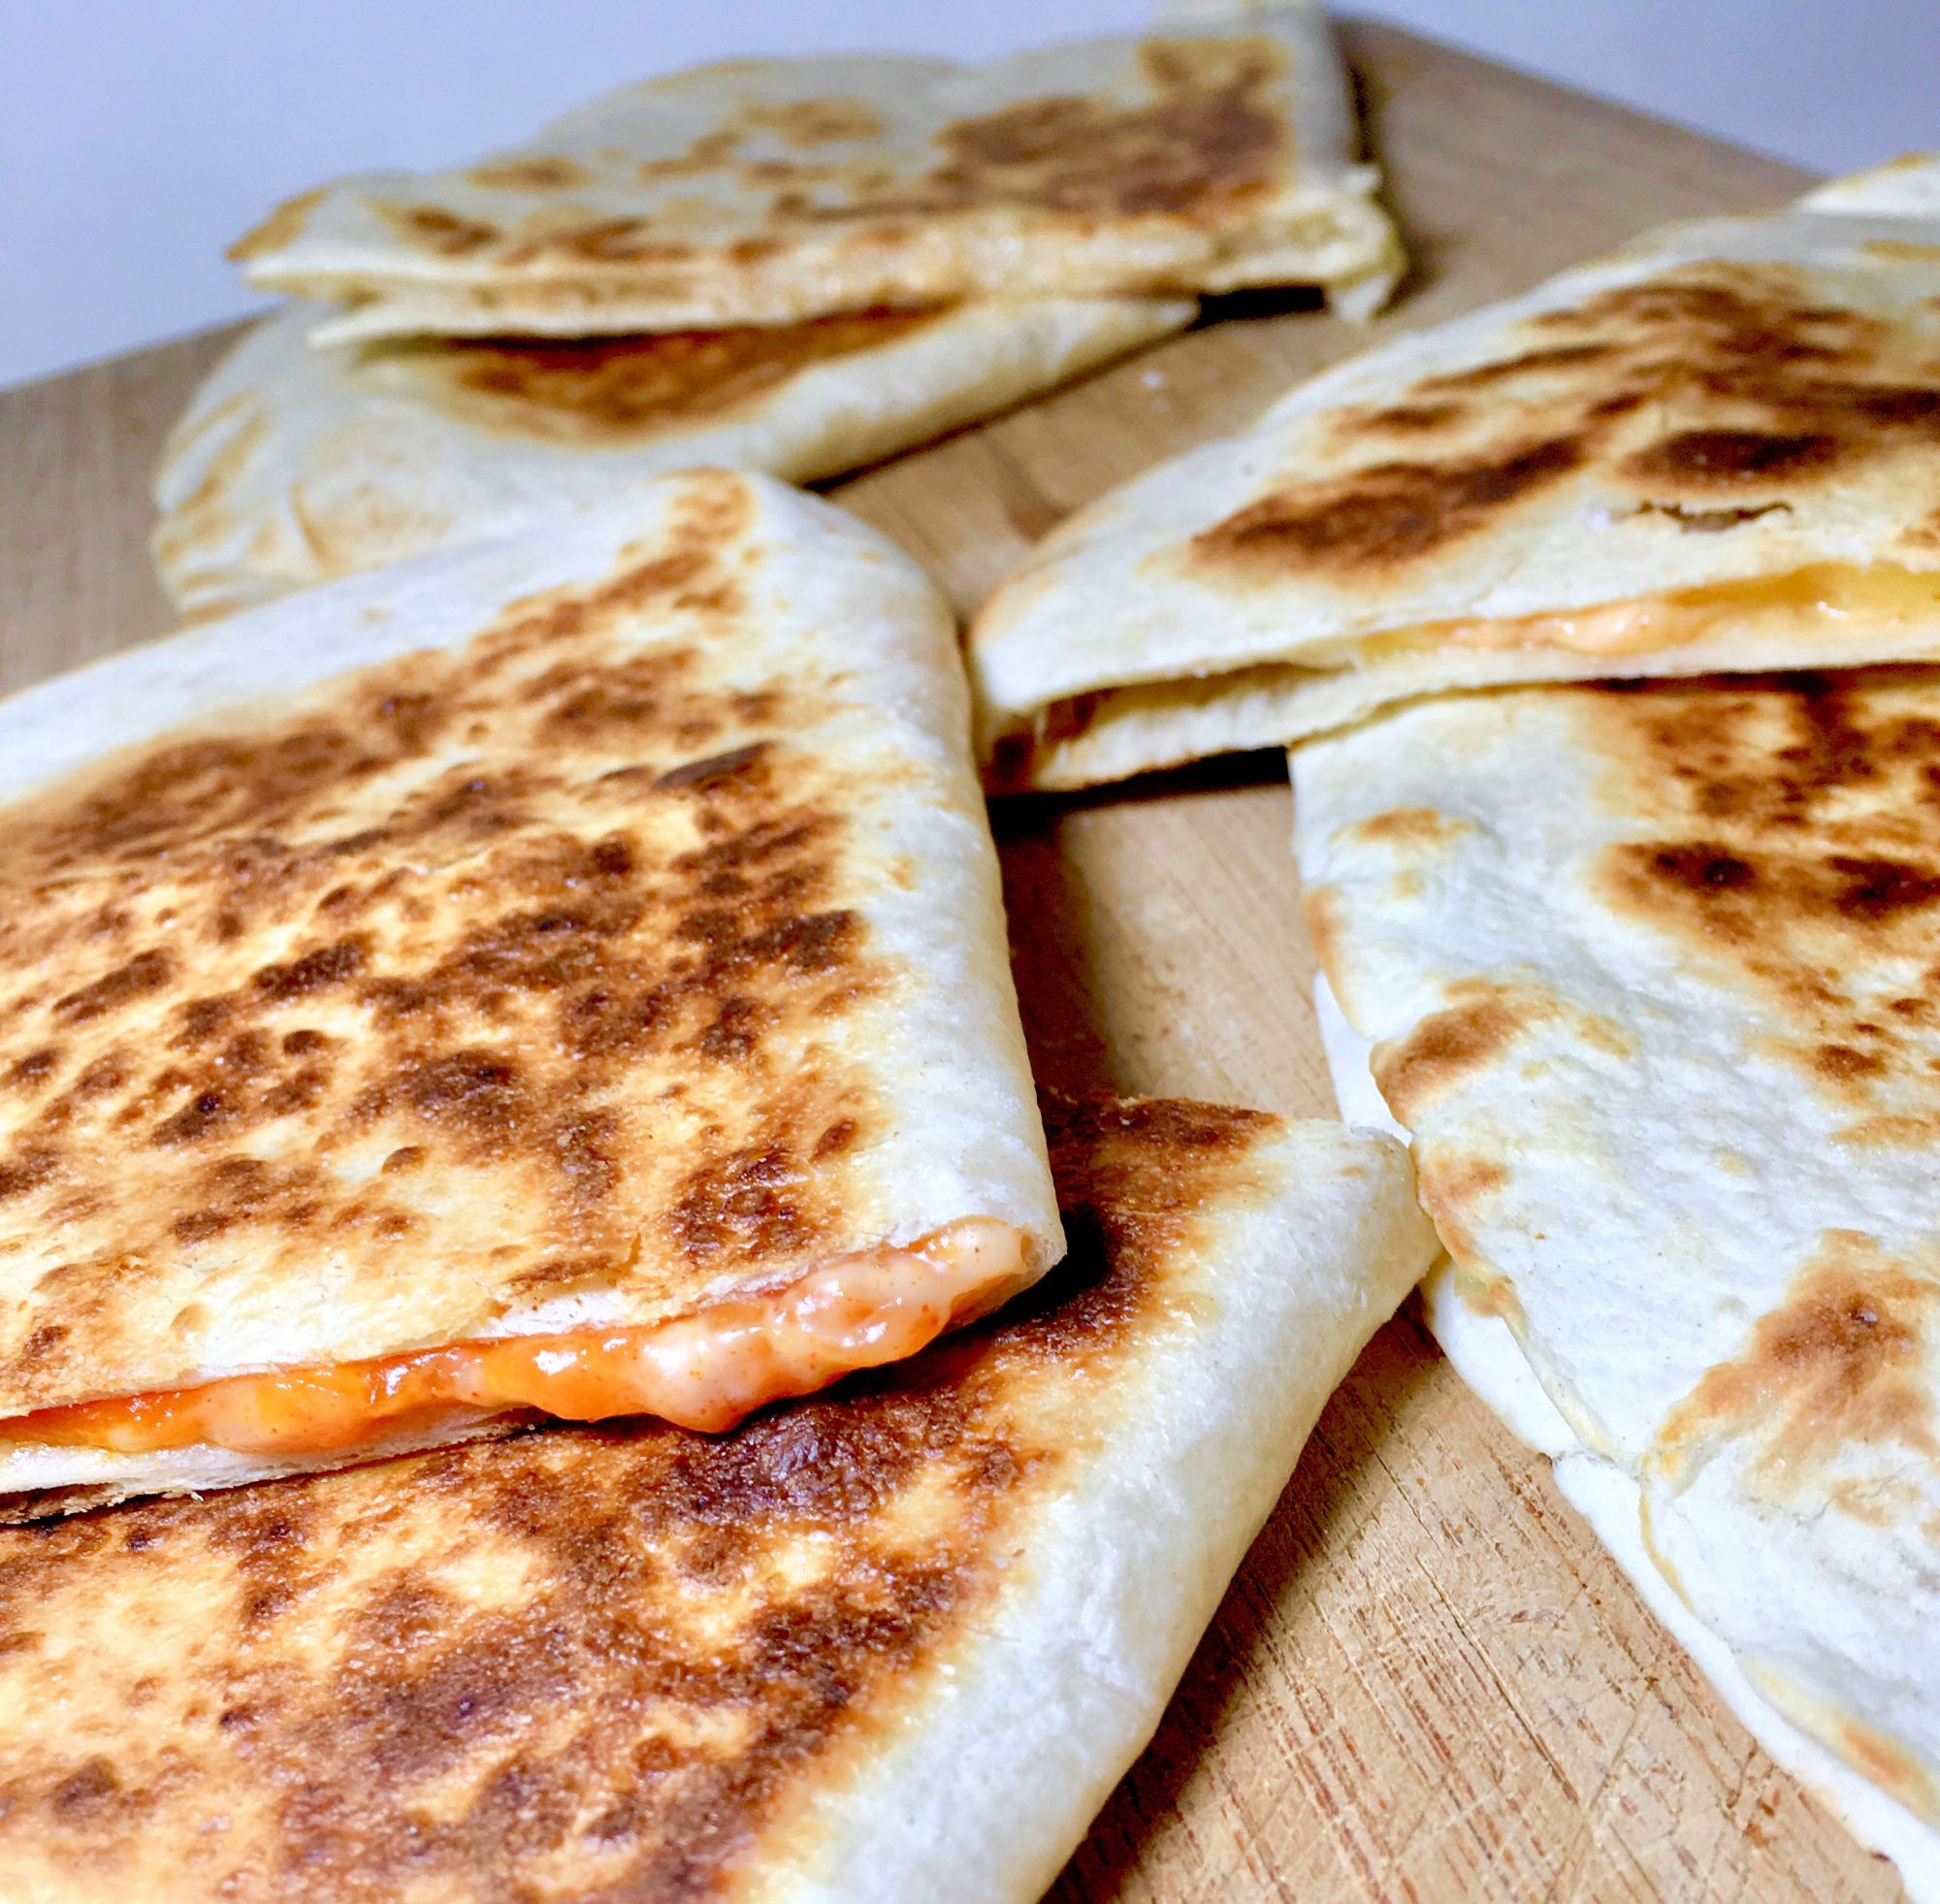 Taco Bell Copycat Vegan Cheese Quesadilla Midnight Munchies More Vegan Cheese Cheese Quesadilla Vegan Taco Bell